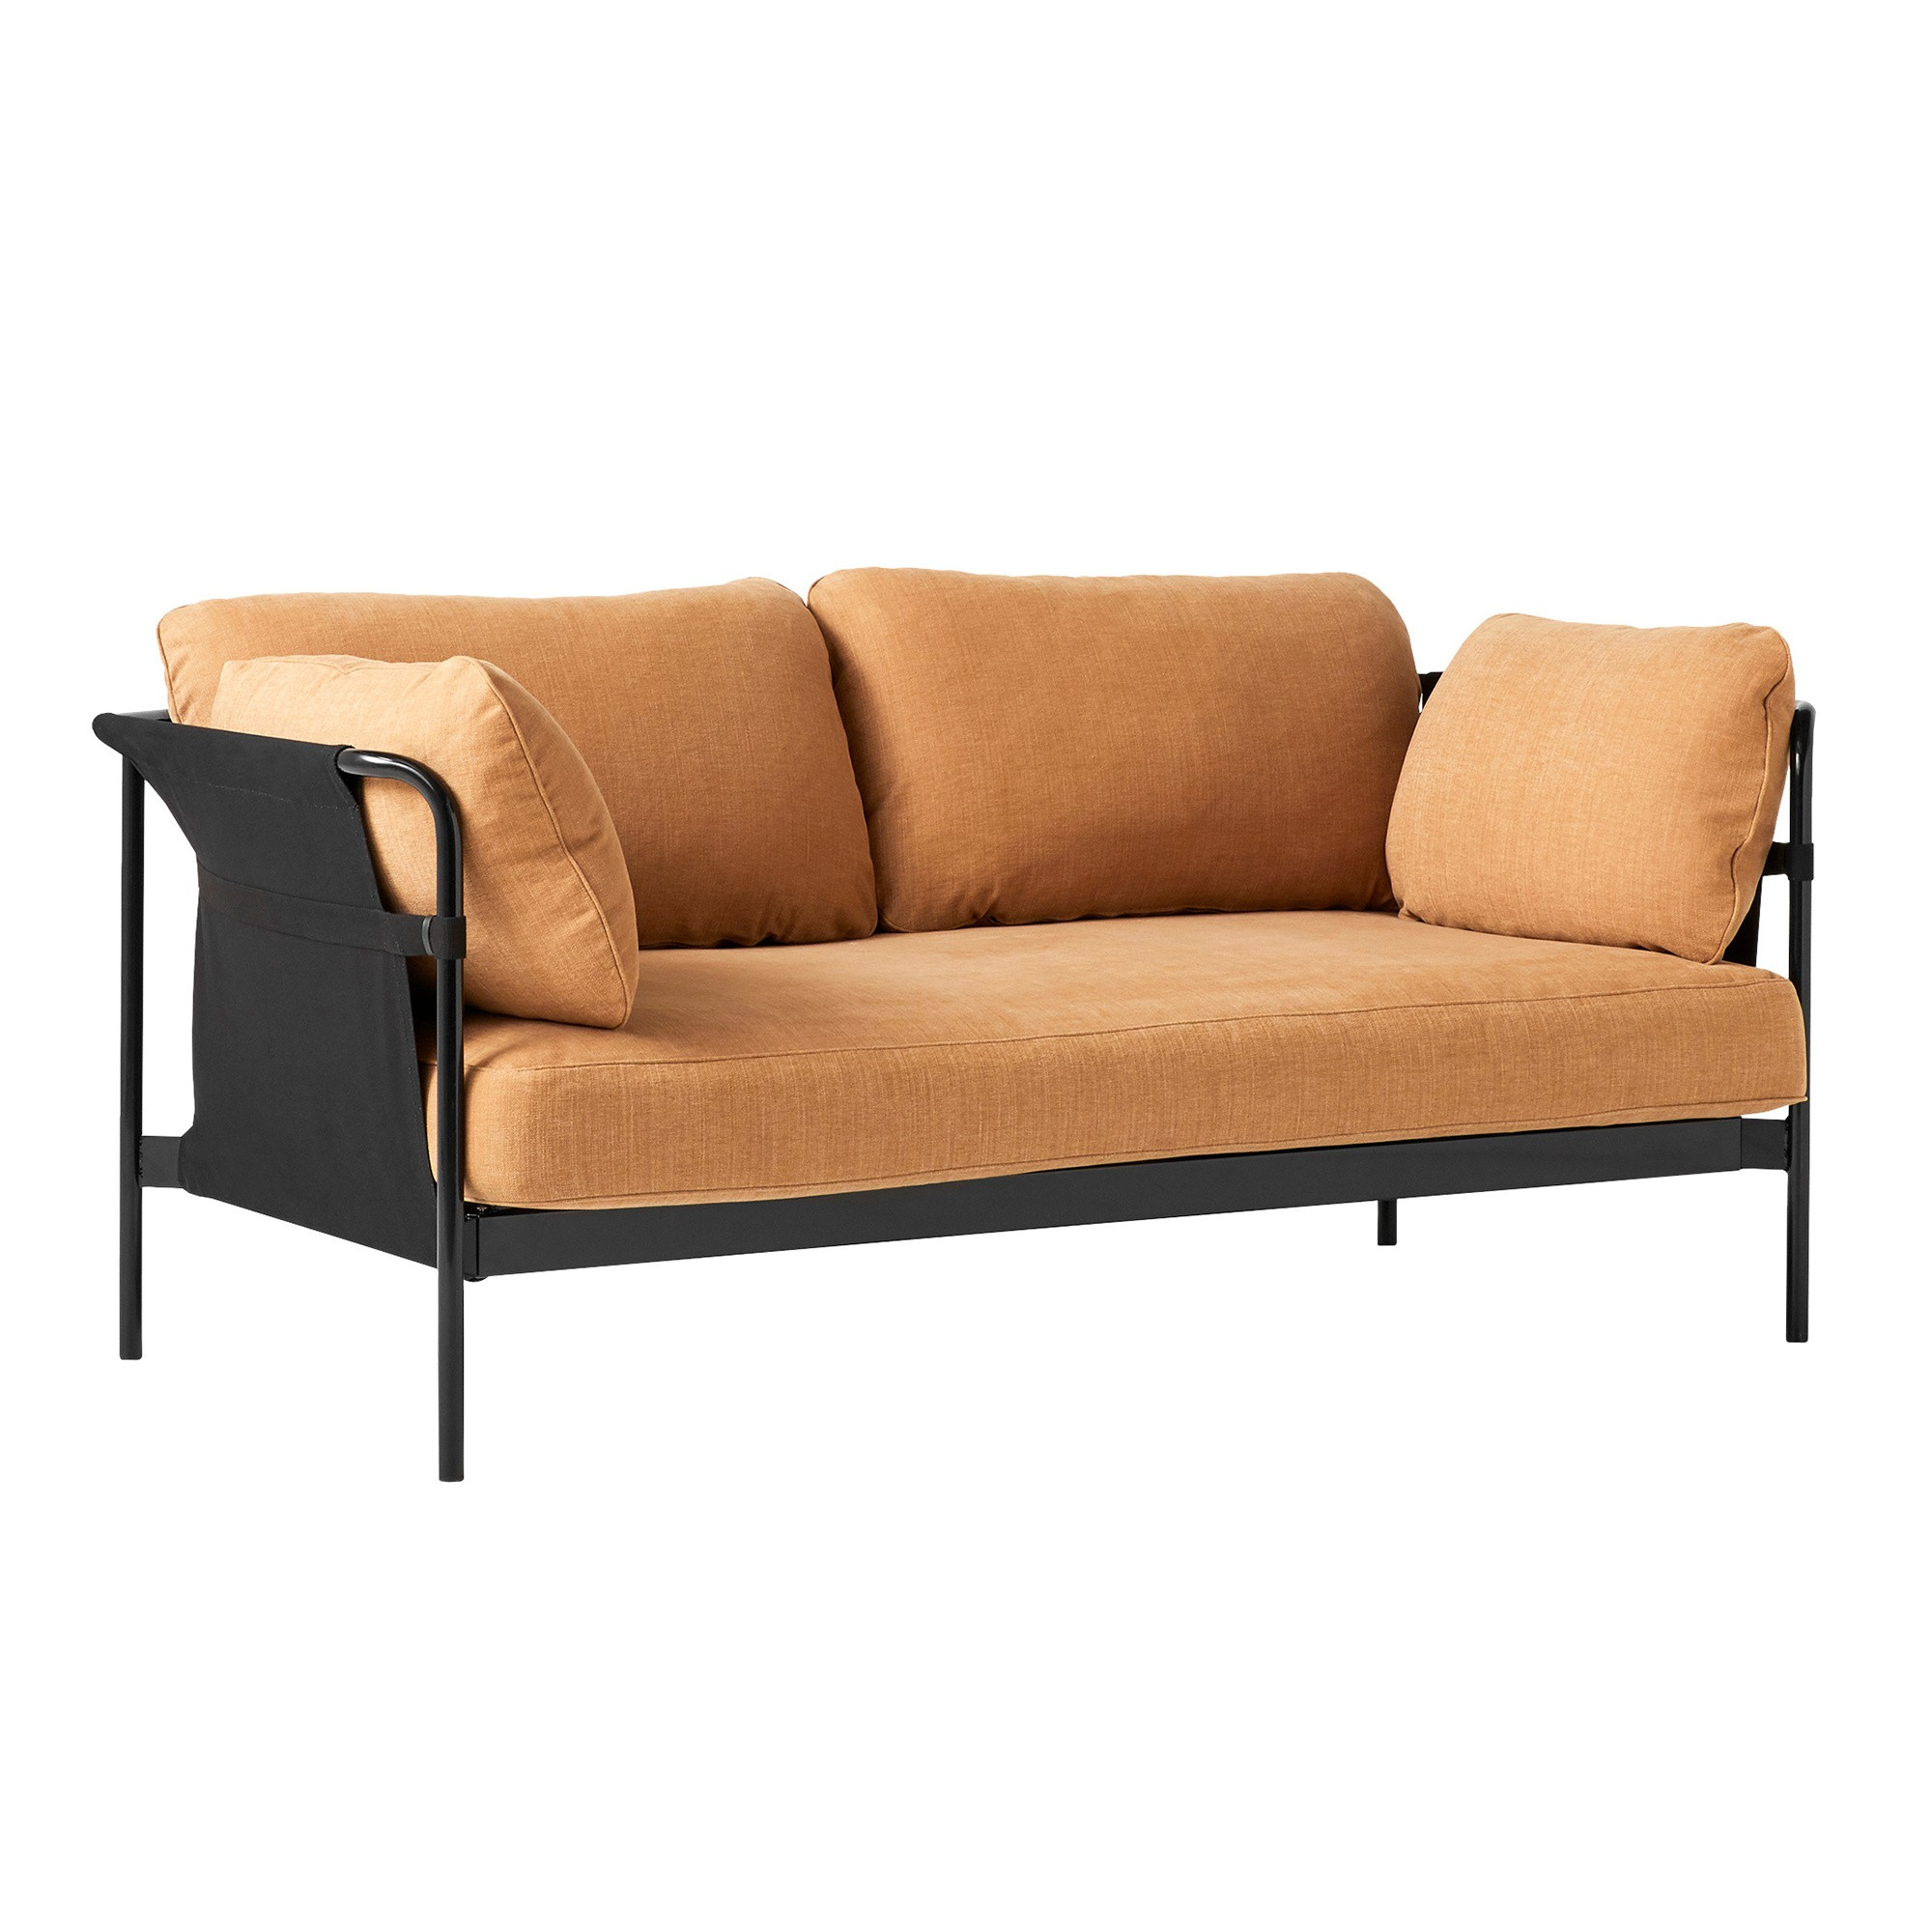 Swell Can 2 0 2 Seater Sofa Frame Steel Black Machost Co Dining Chair Design Ideas Machostcouk